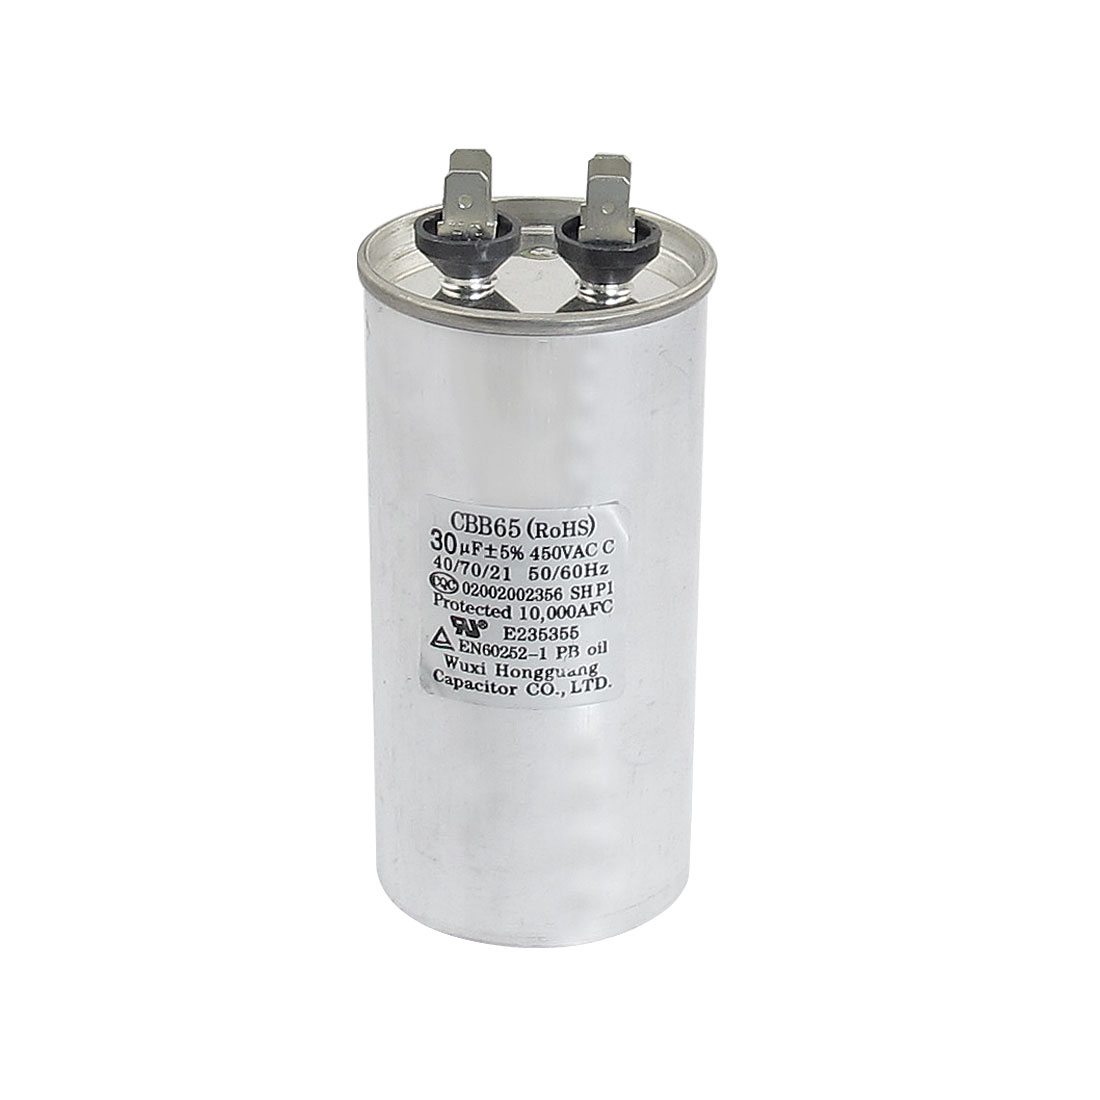 CBB65 Polypropylene Film Lug Terminals Motor Capacitor 450VAC 30uF 5%